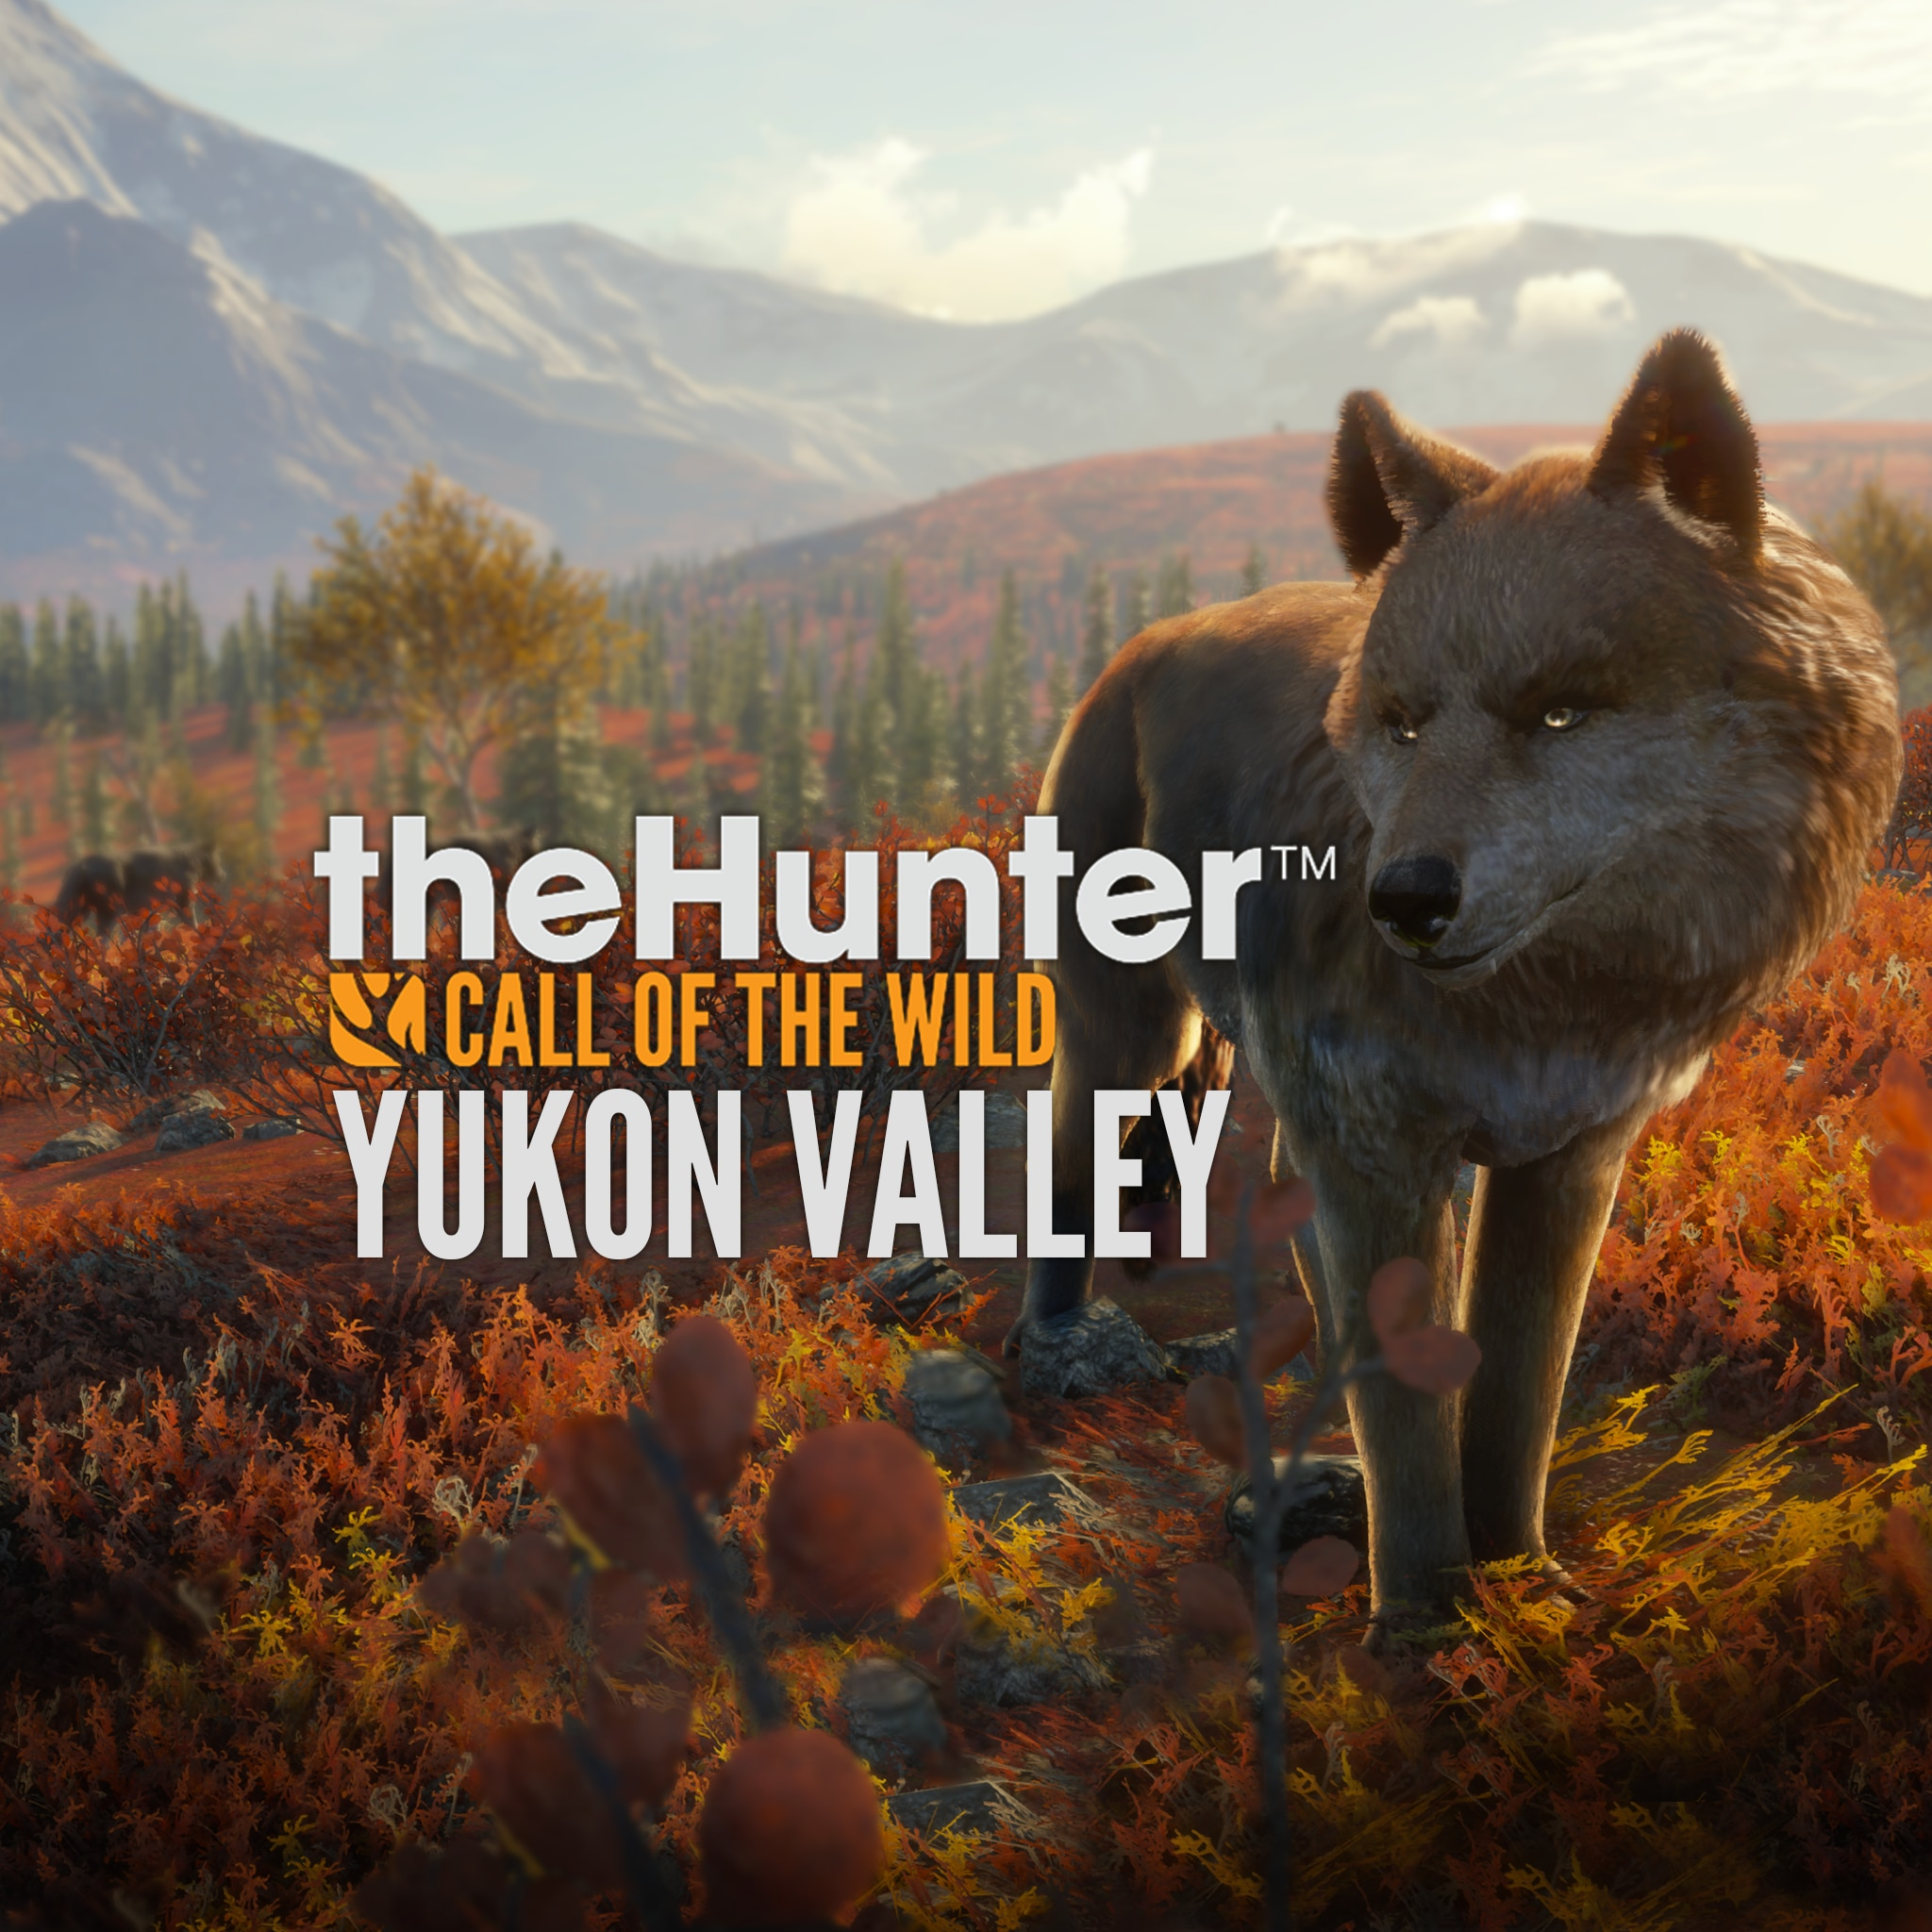 theHunter™: Call of the Wild - Yukon Valley